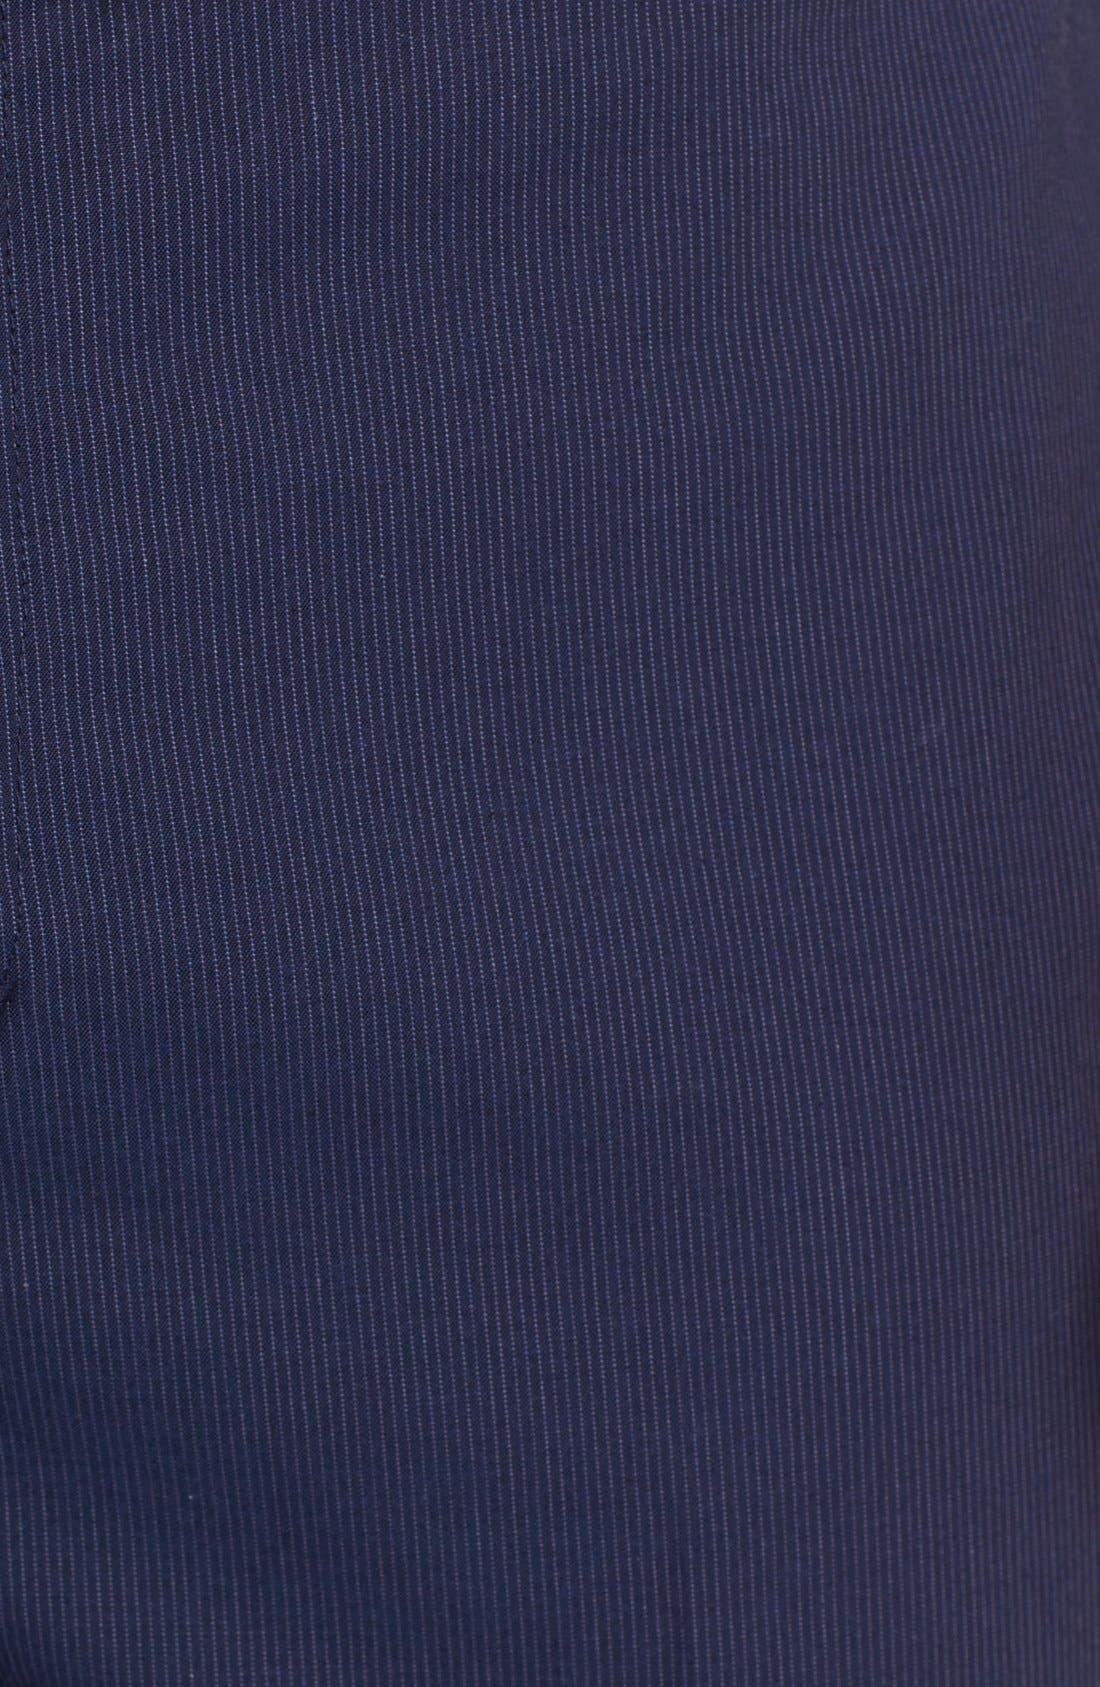 Alternate Image 3  - Calibrate 'Rhoden' Stripe Trousers (Tall)